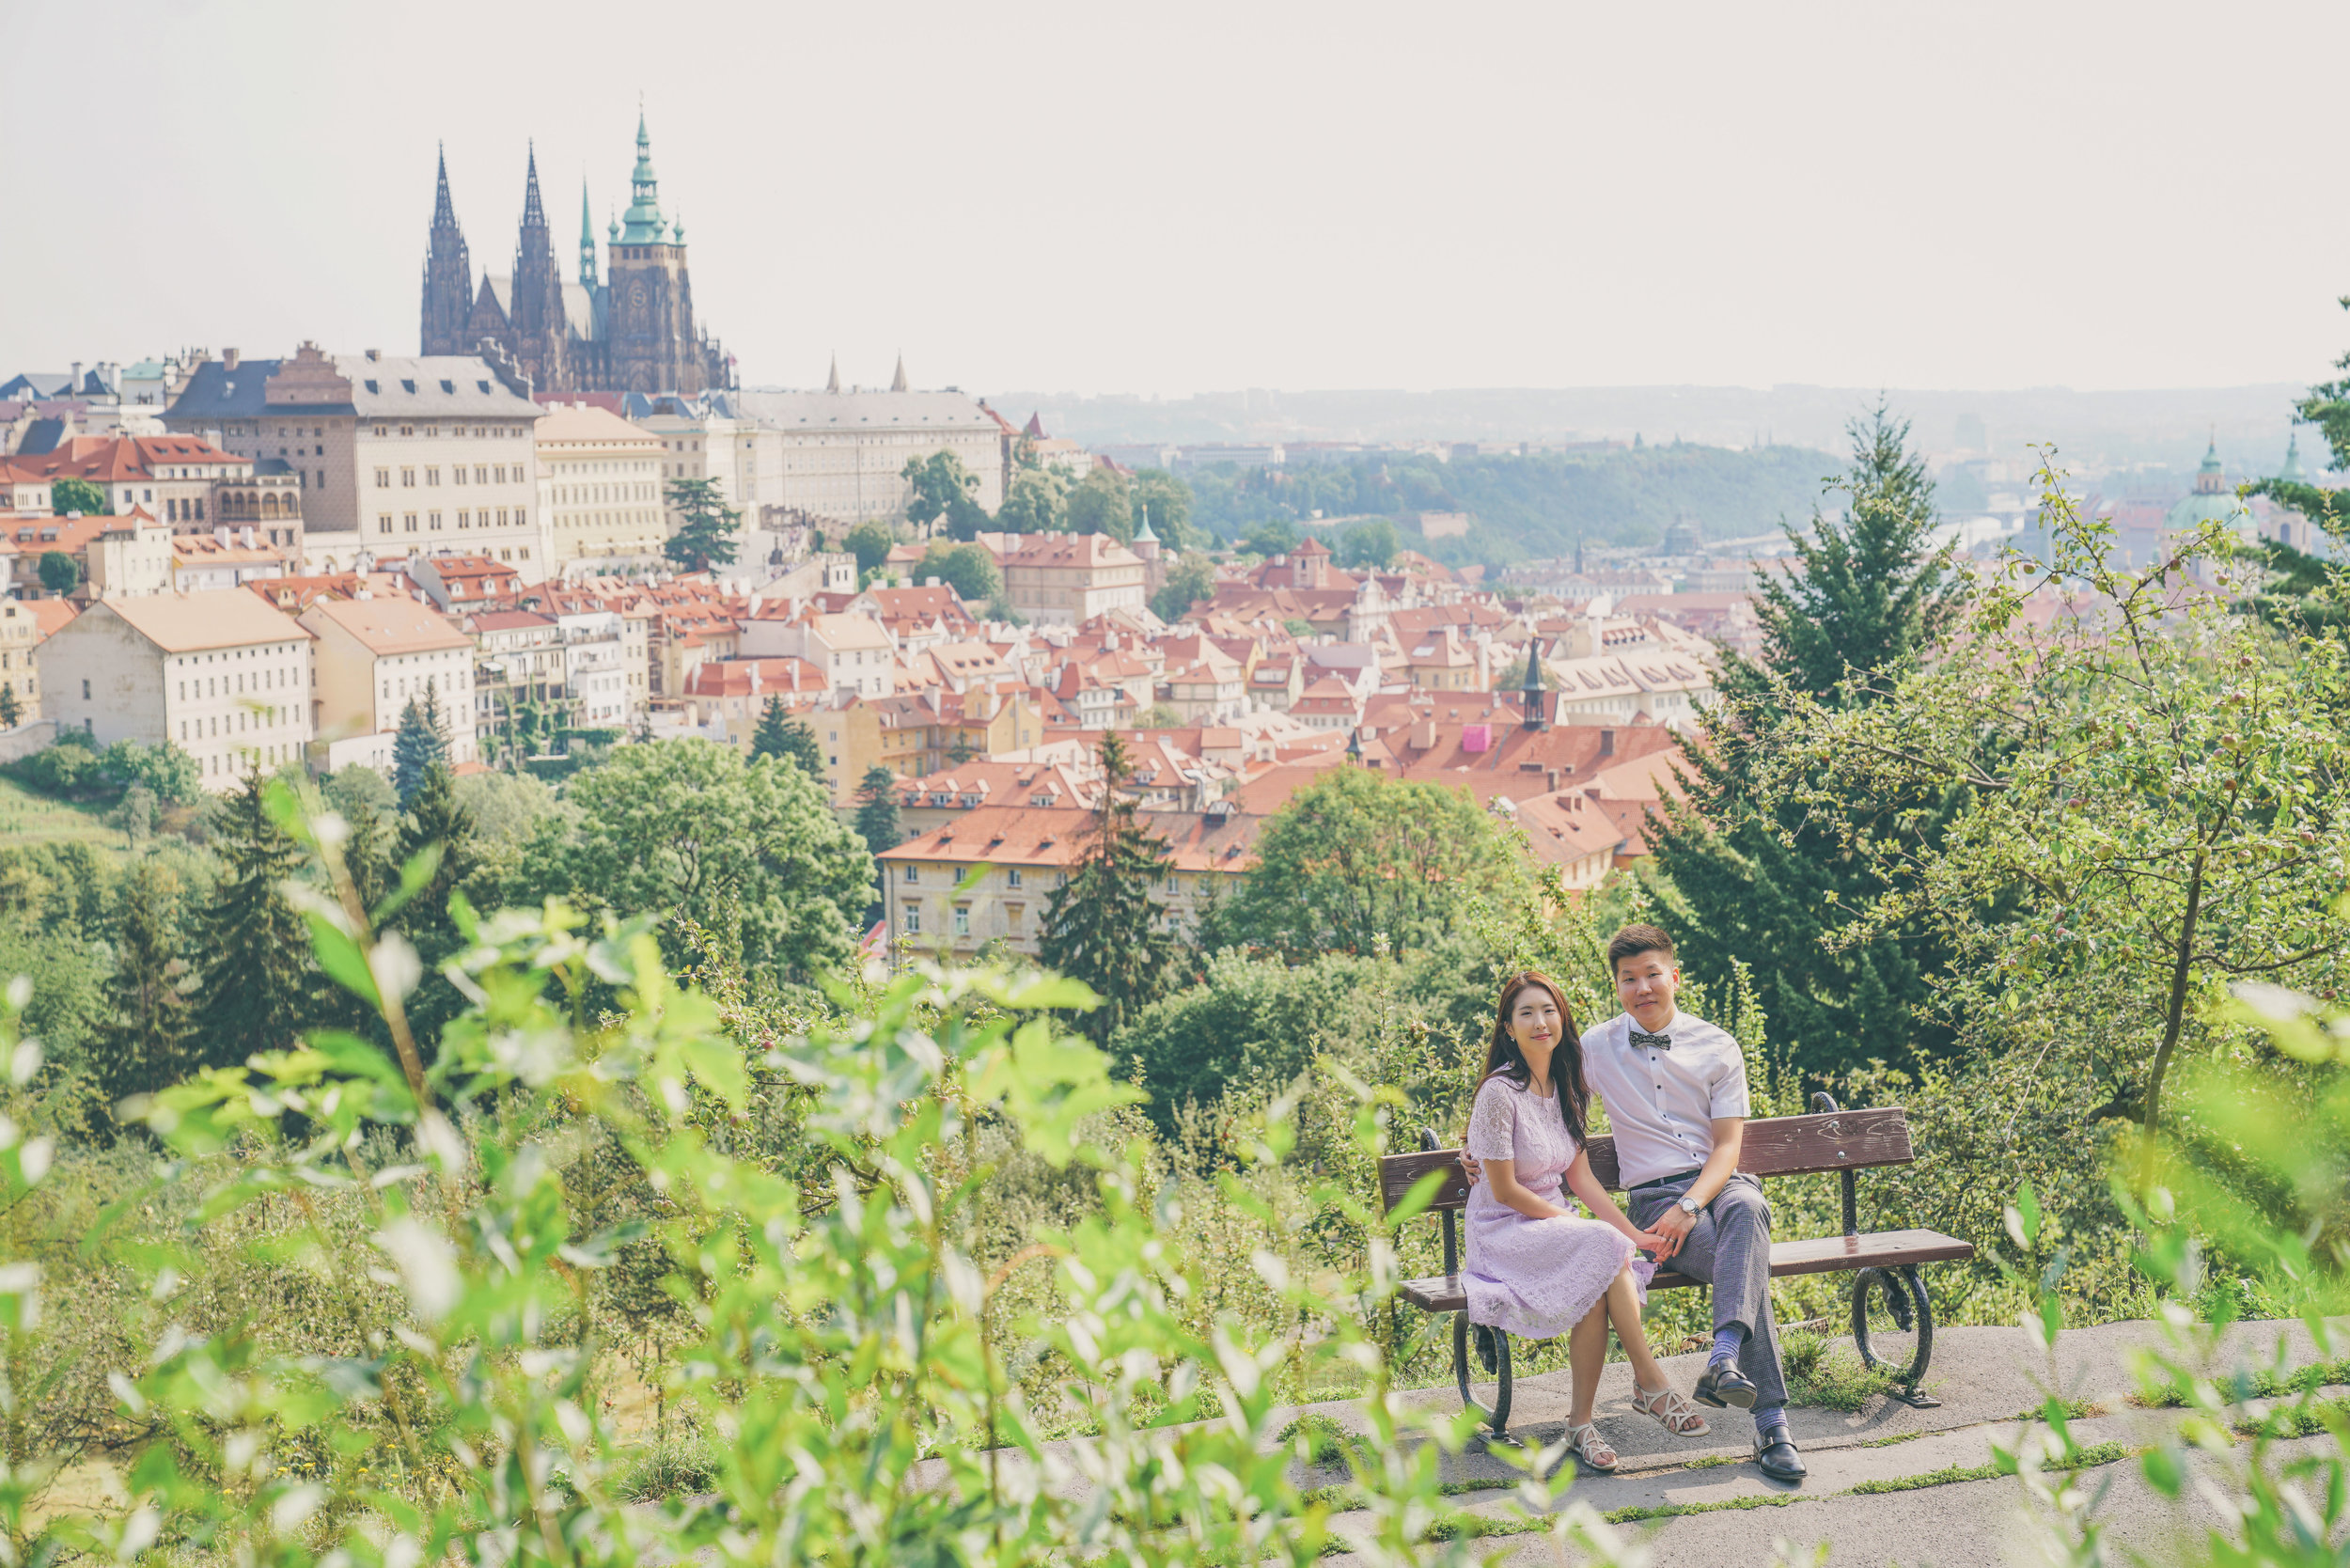 Sprazzi_Professional_Photography_Photographer_Prague_Czech-Republic_Irene_Original_14.jpg